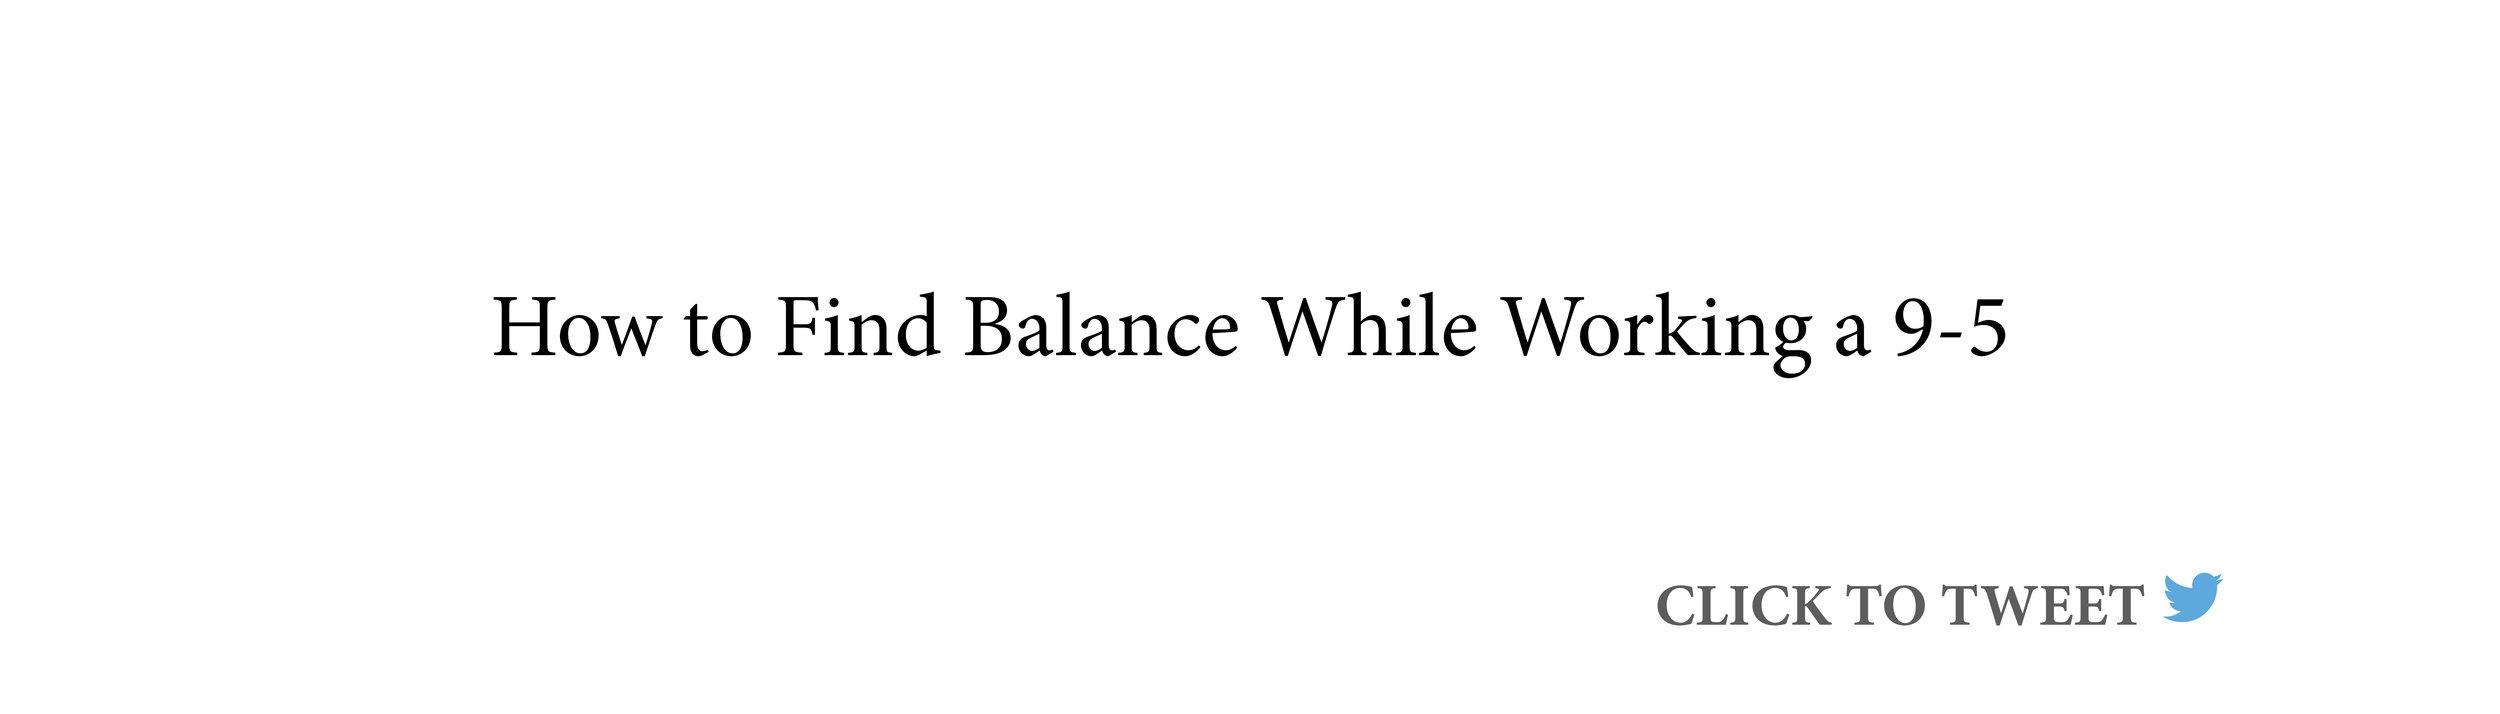 balance95tweet1.jpg